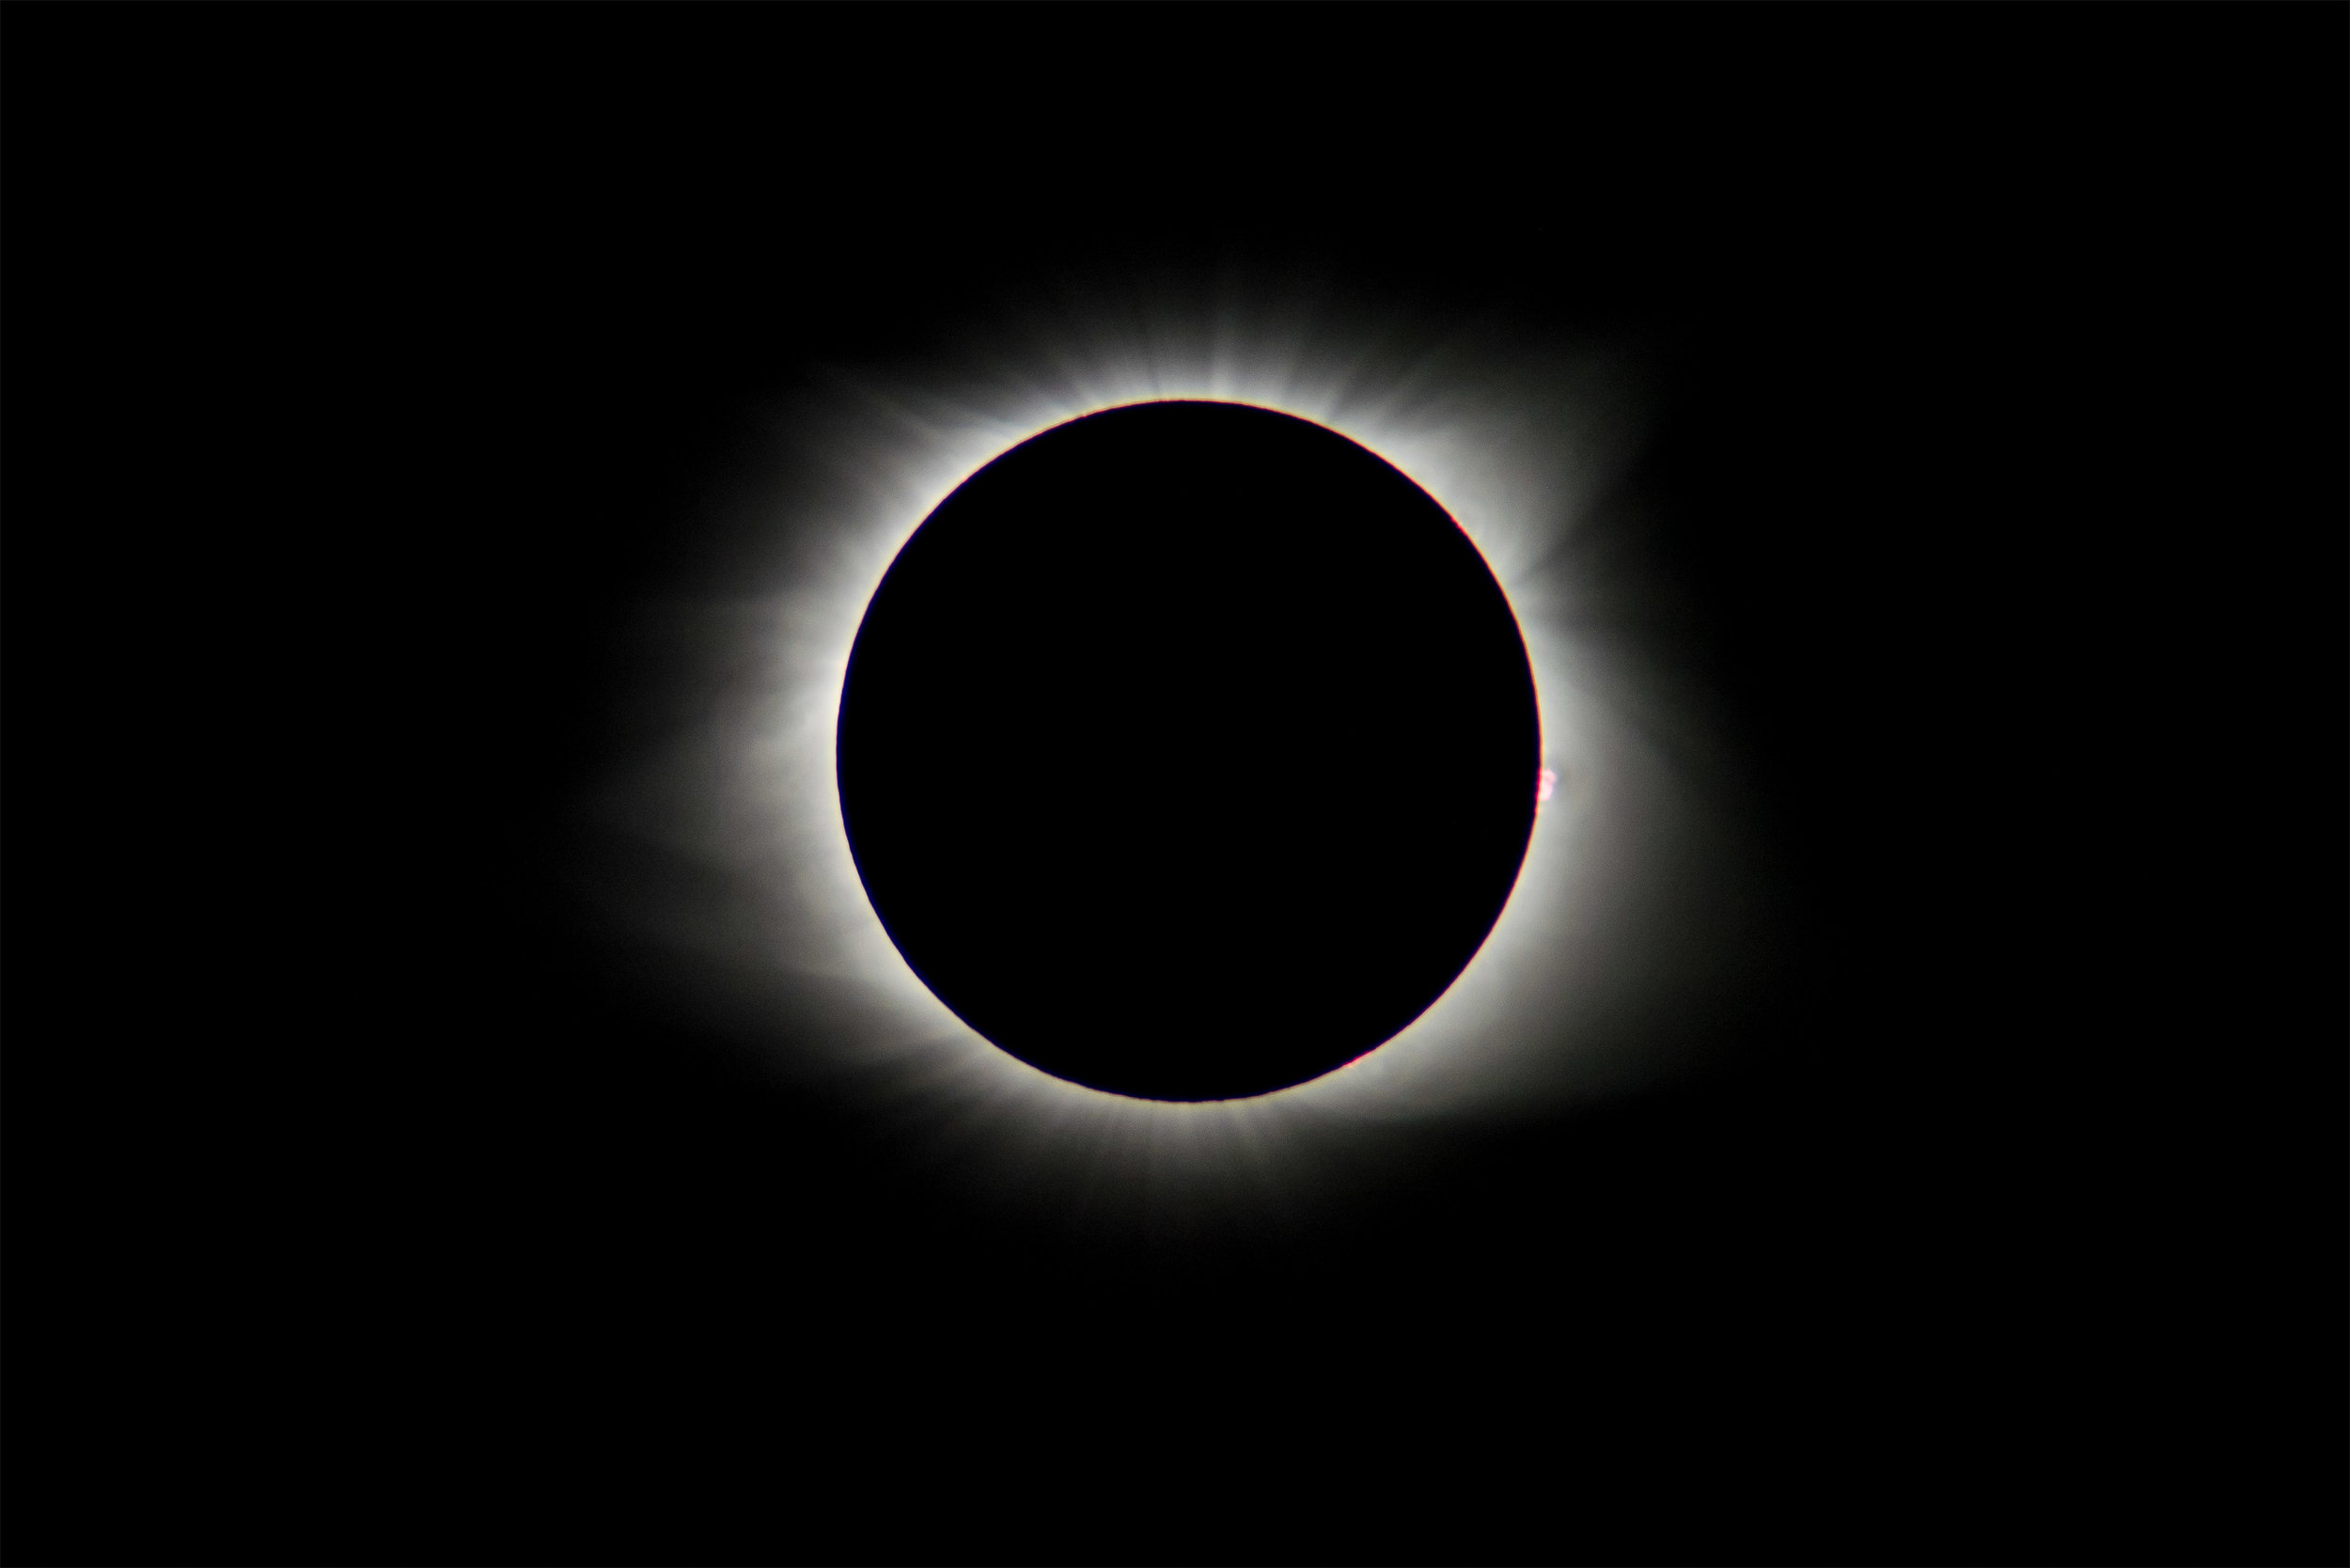 SolarEclipse_20170821_001.jpg